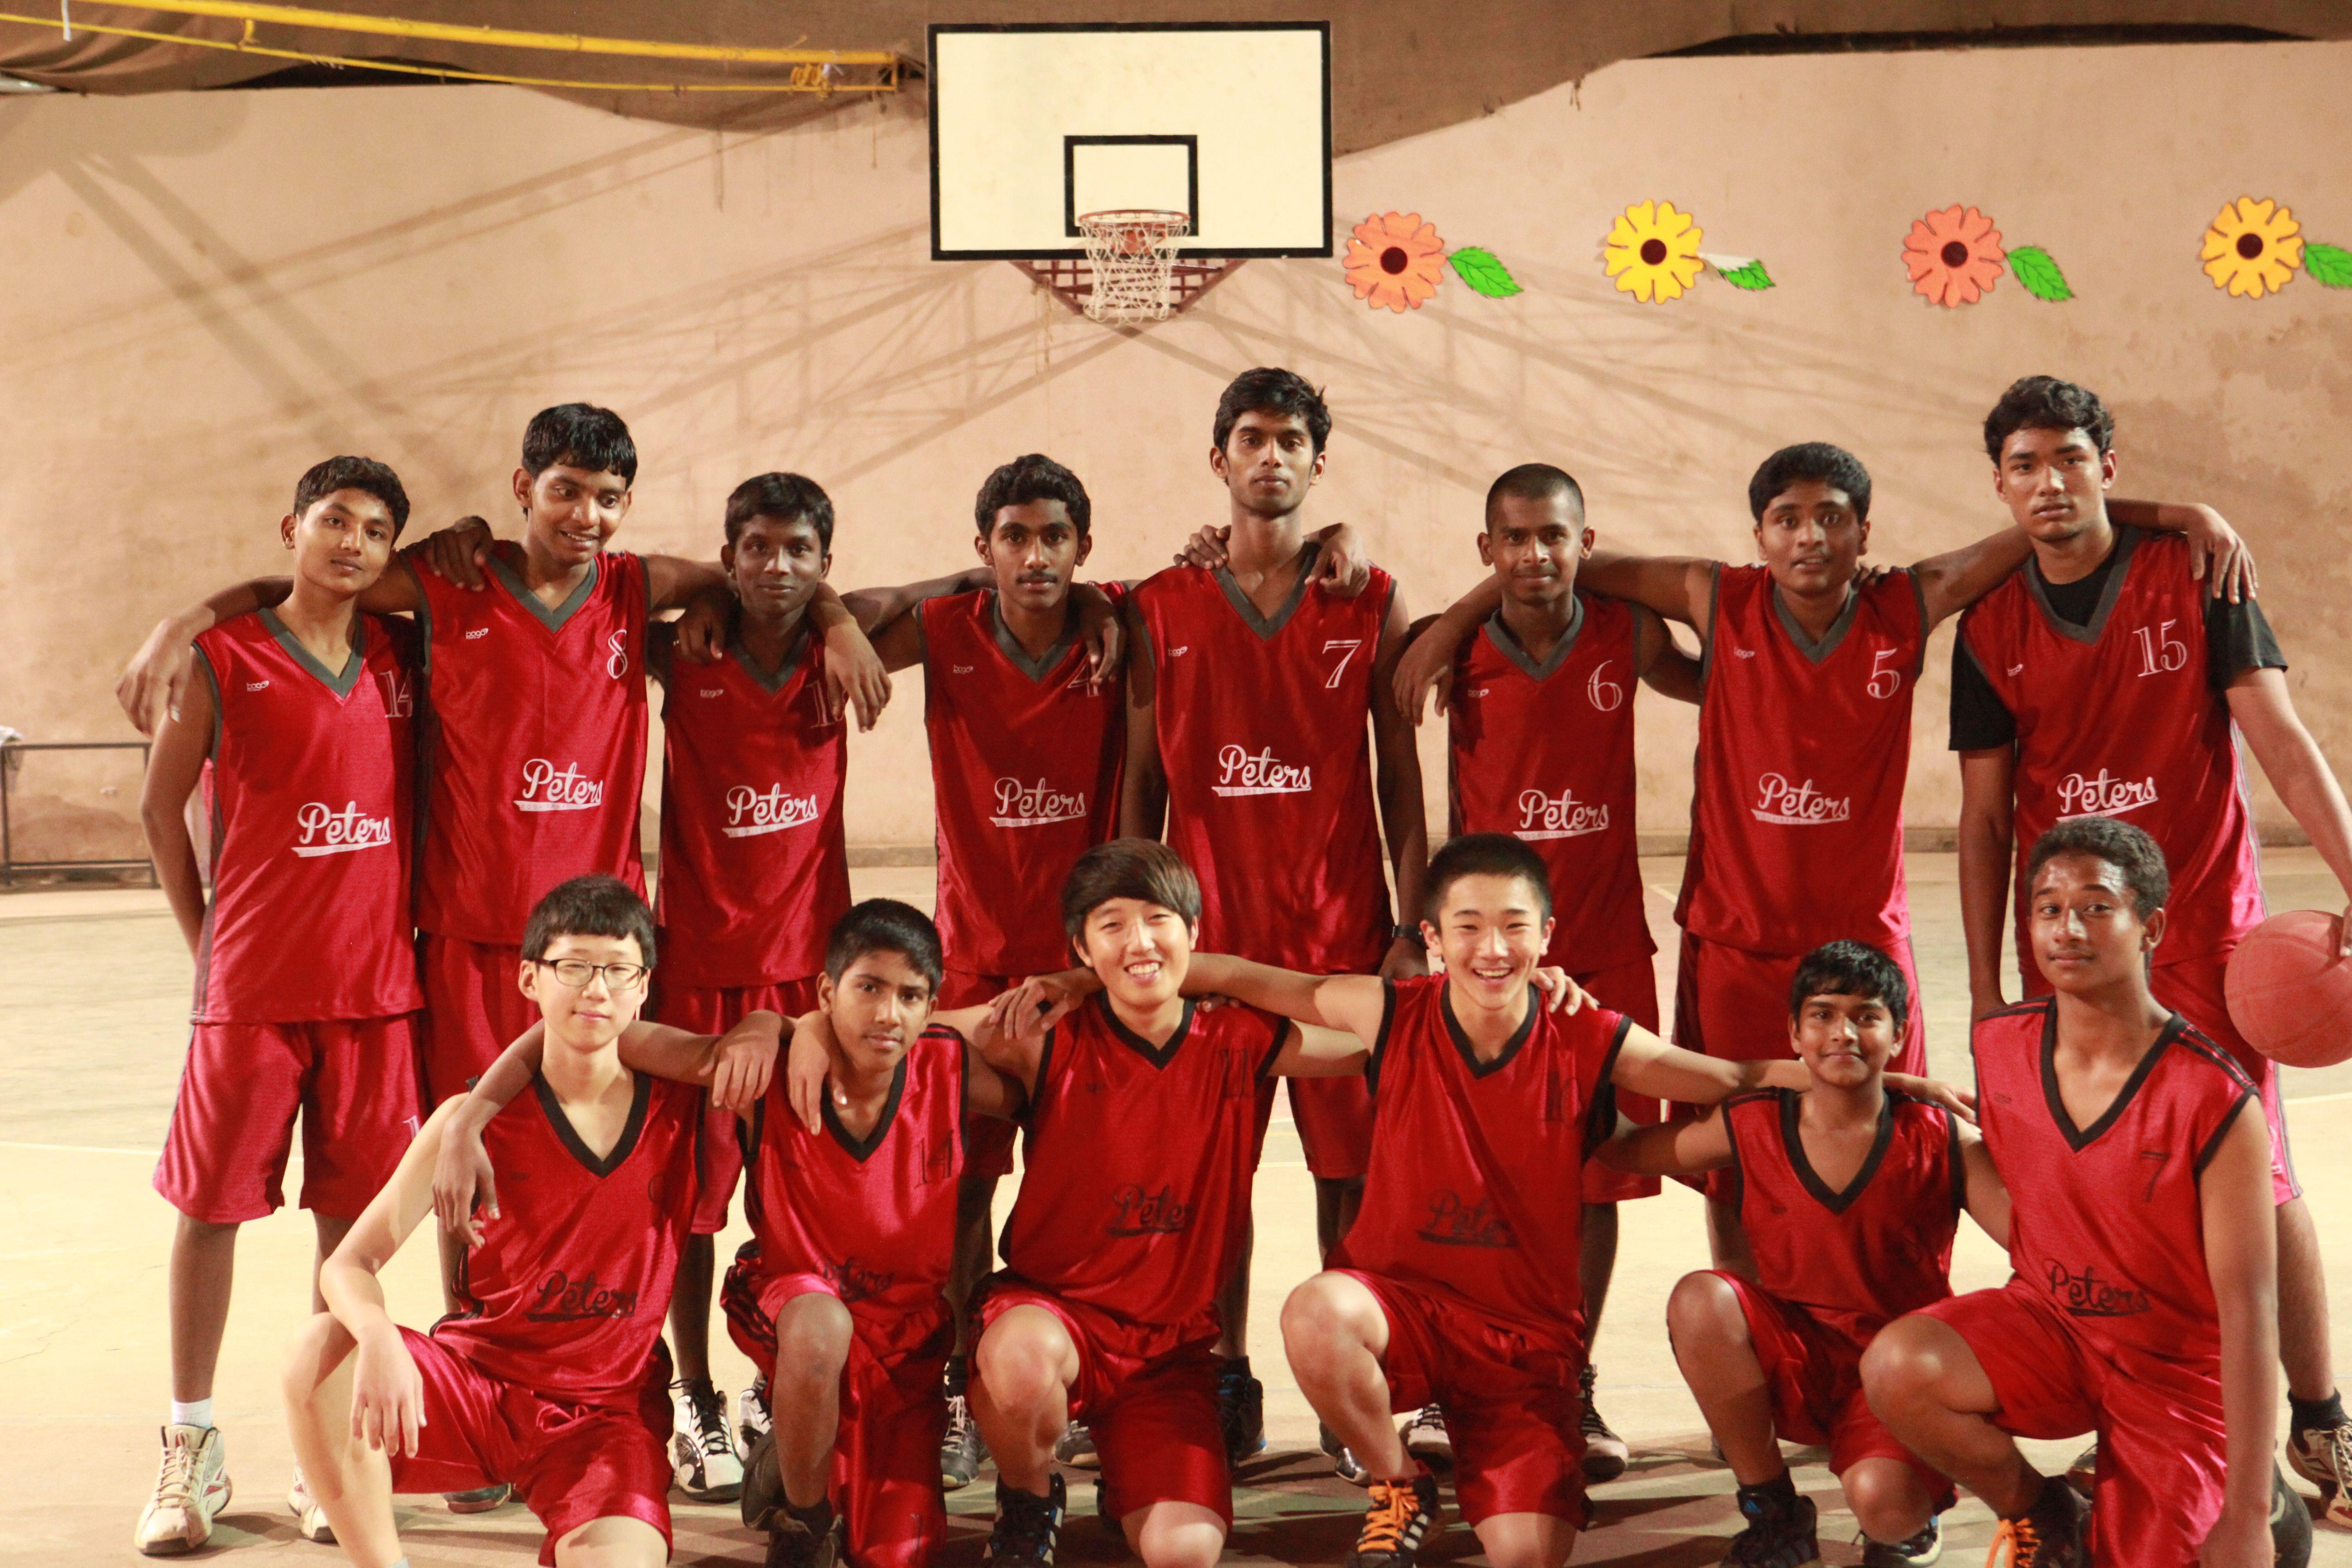 Basket Ball Team Of St Peters School Kodaikanal India St Peters Sports Kodaikanal